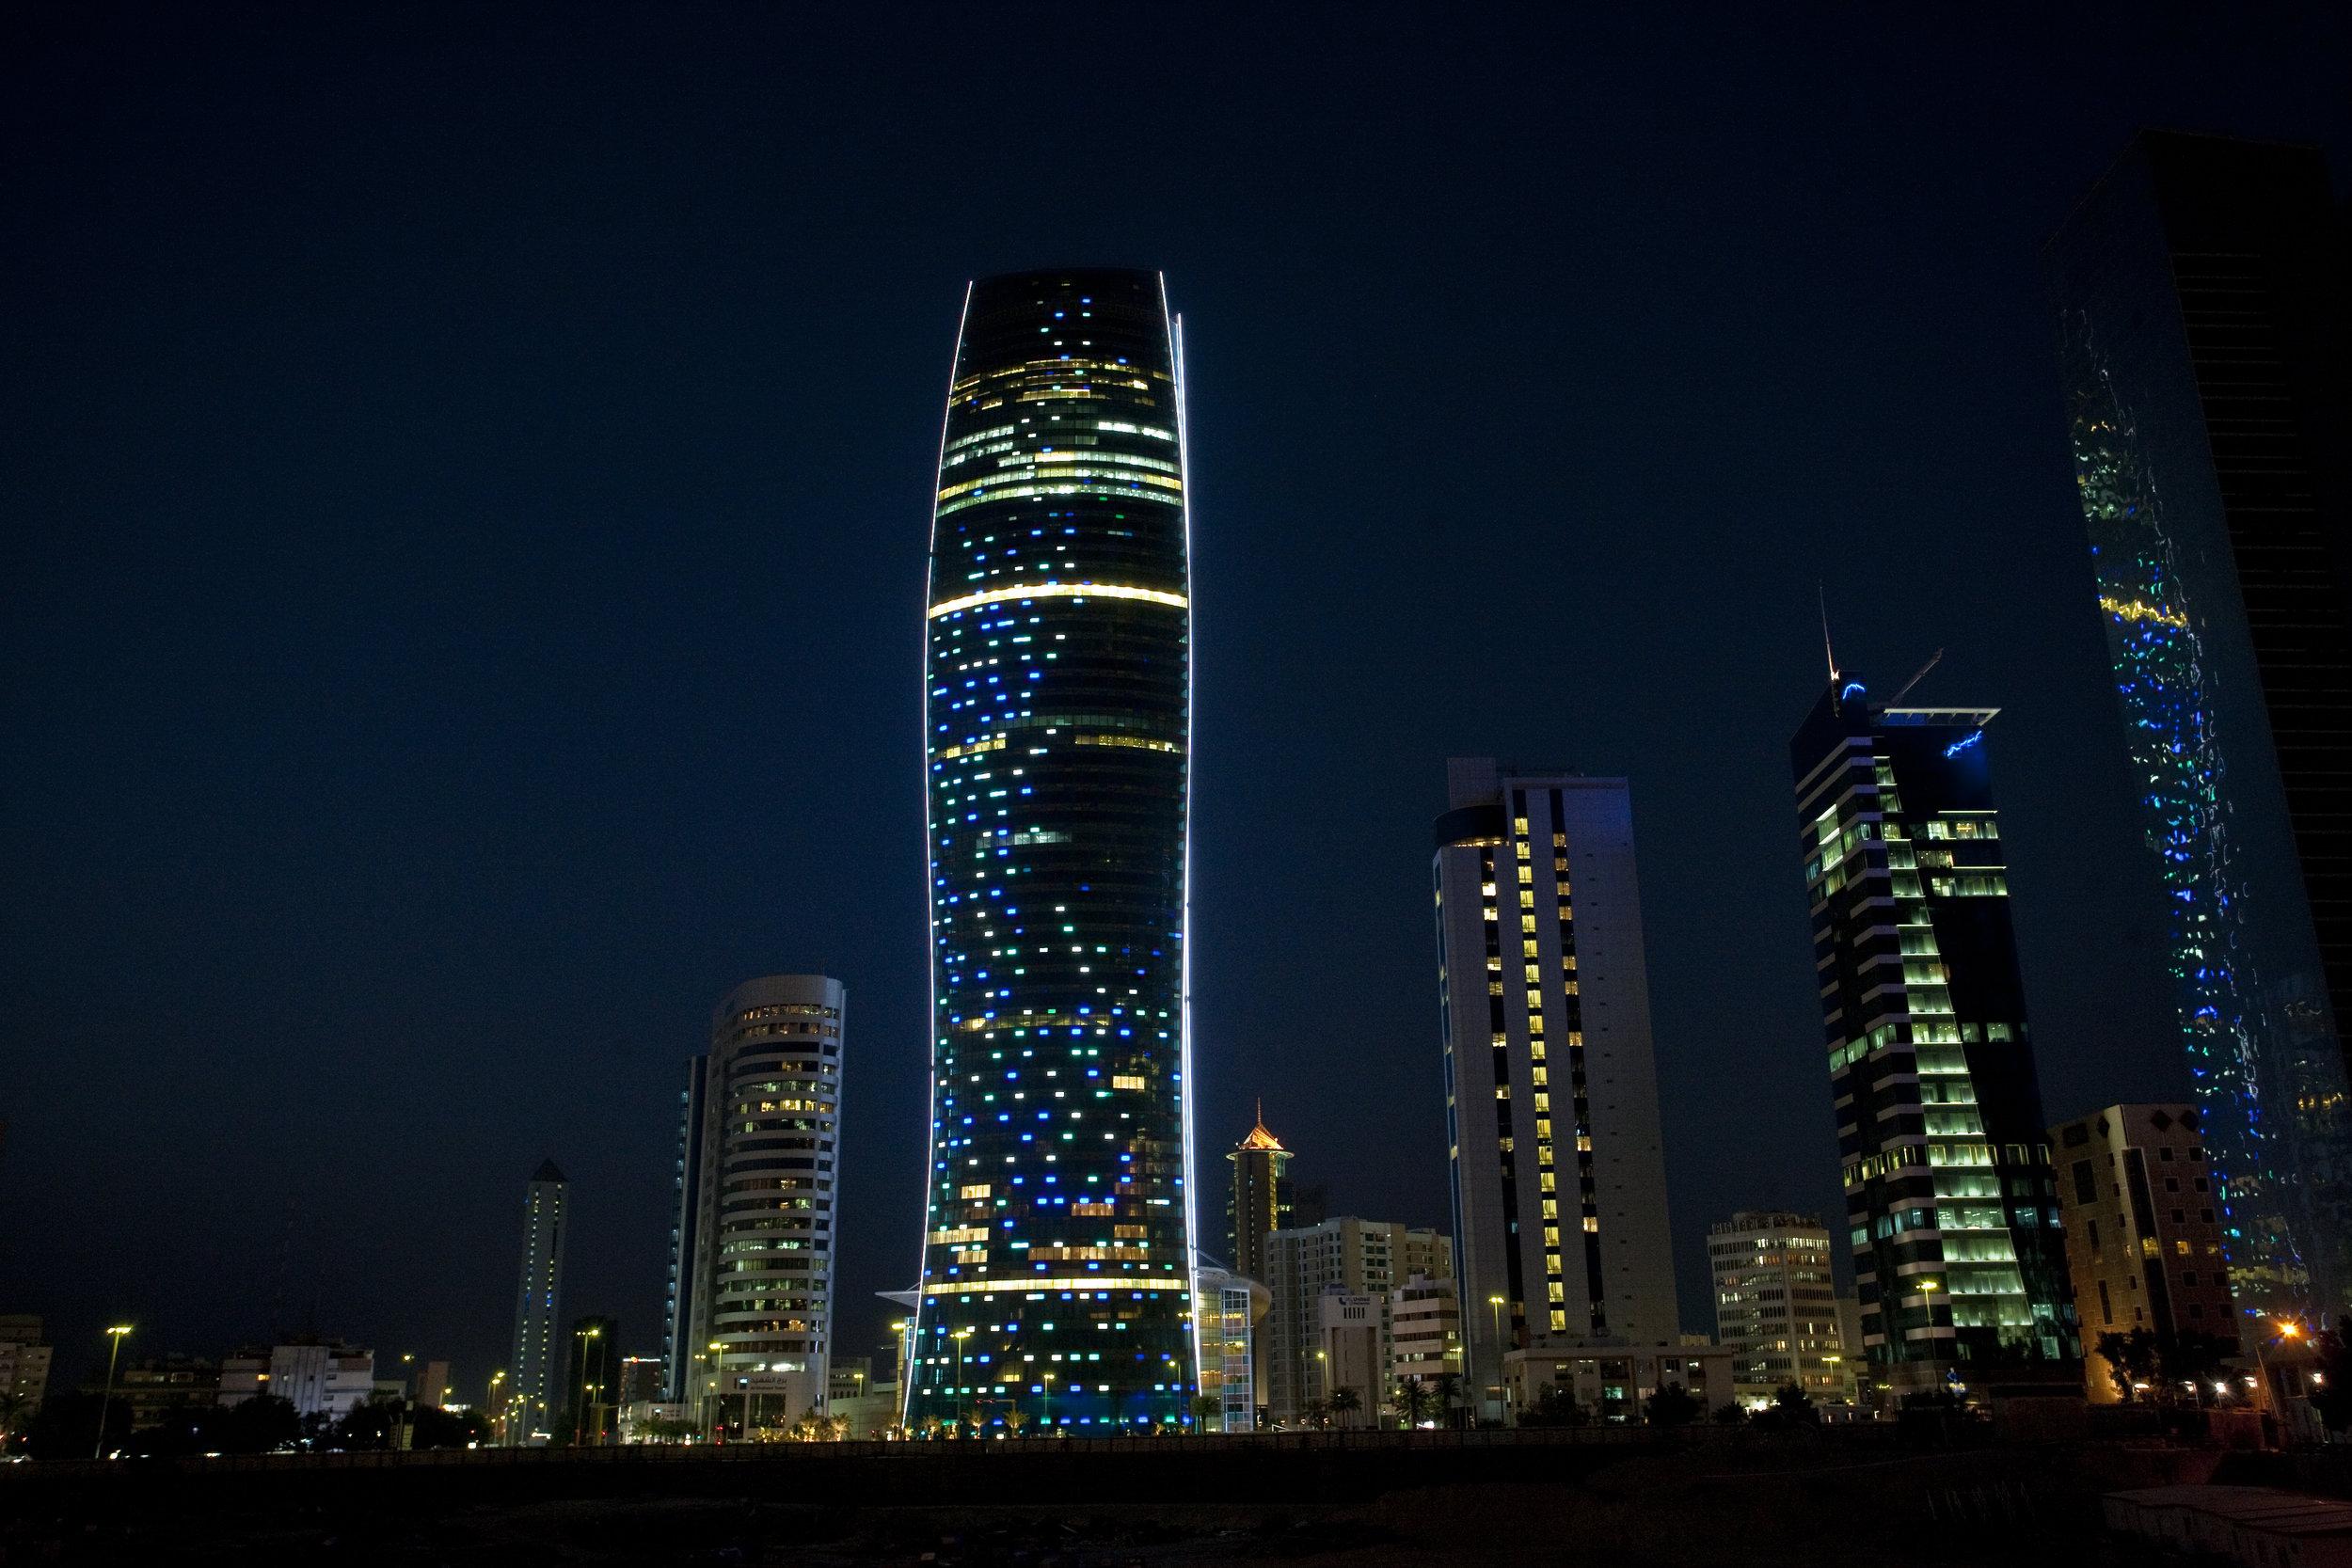 KIPCO Tower